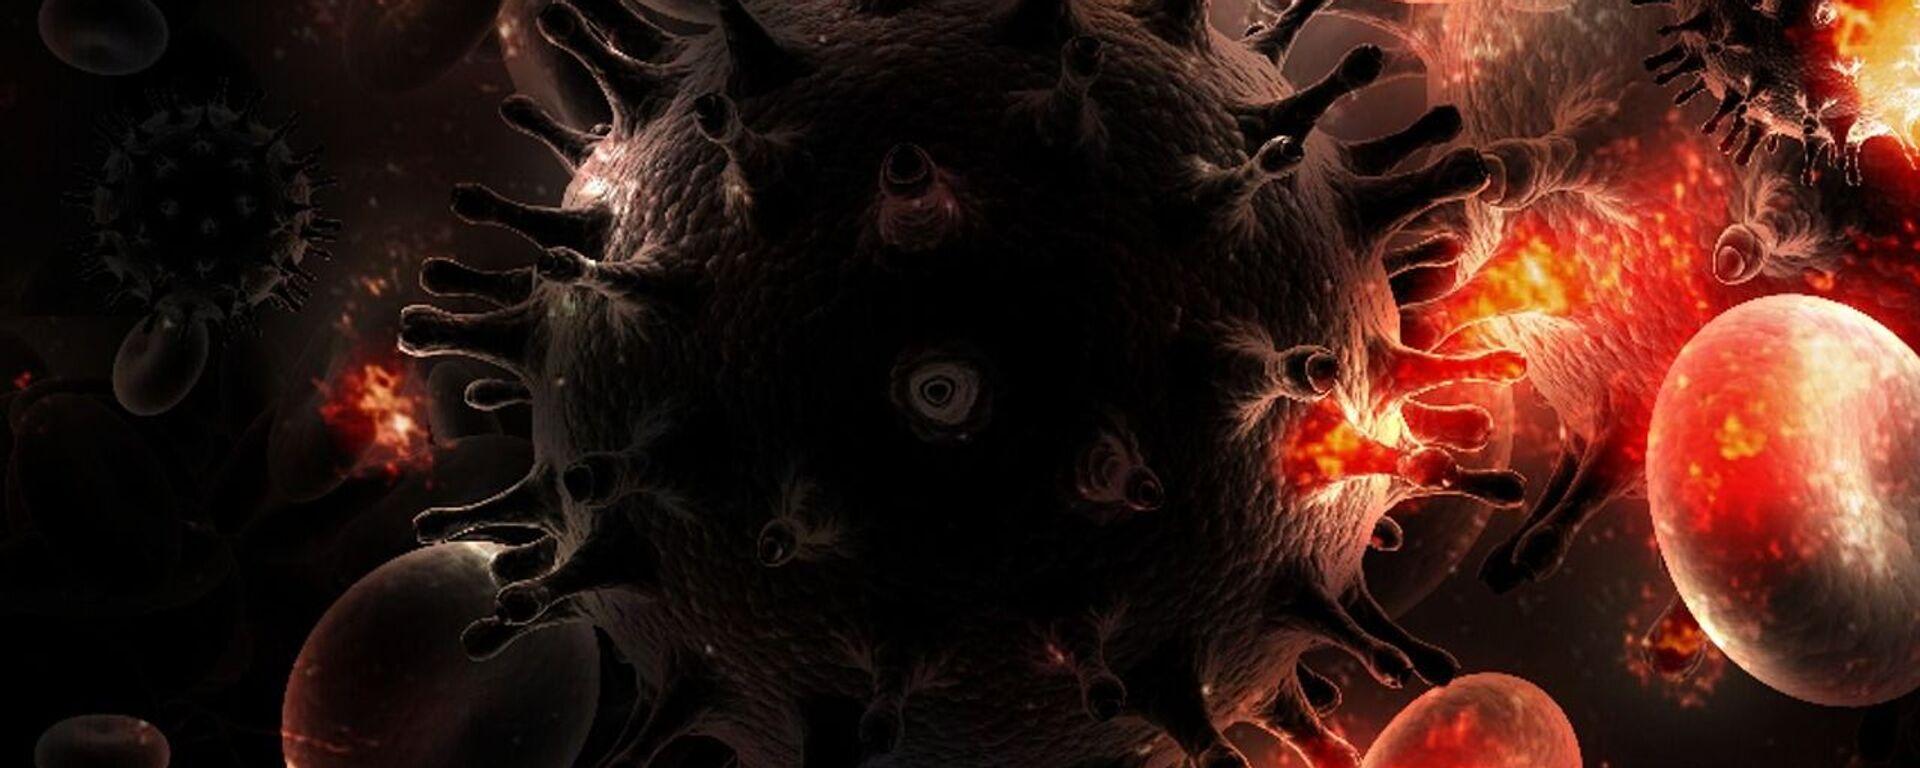 El virus VIH - Sputnik Mundo, 1920, 25.08.2021